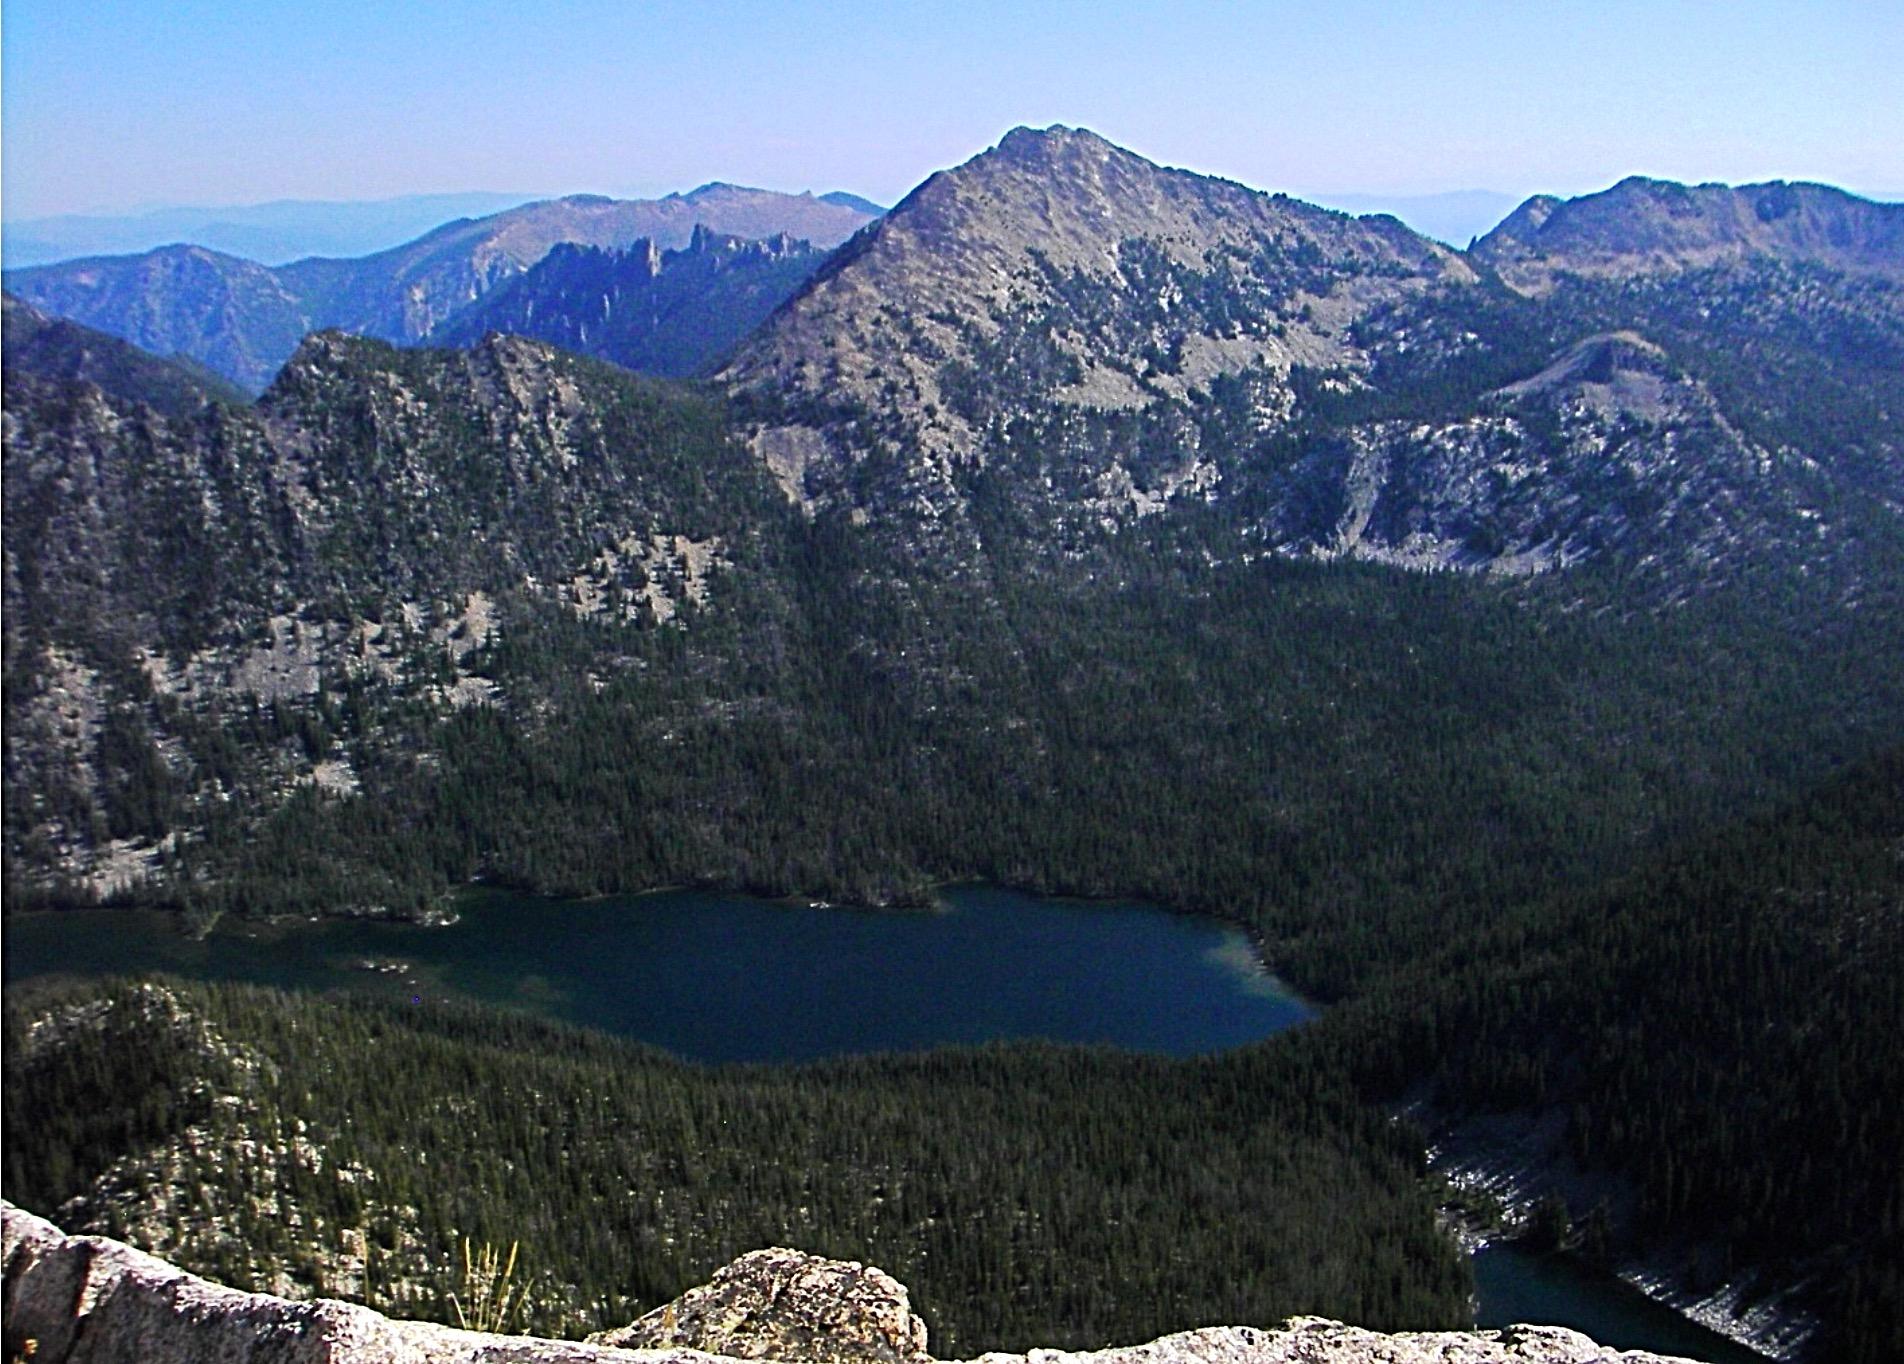 Mt. McGuire from Aggipah Mountain with the WSW ridge in view and the SE ridge in profile. Judi Steciak Photo